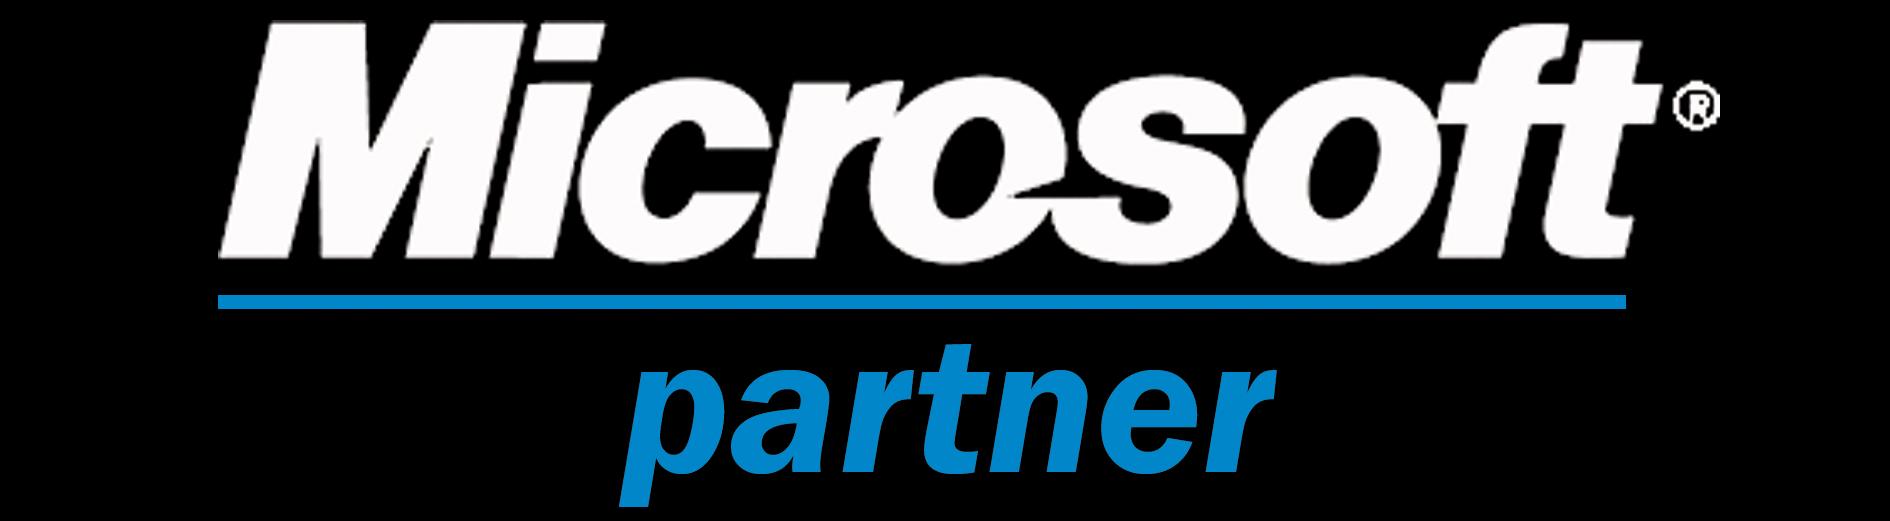 logo%20microsoft%20partner.jpg